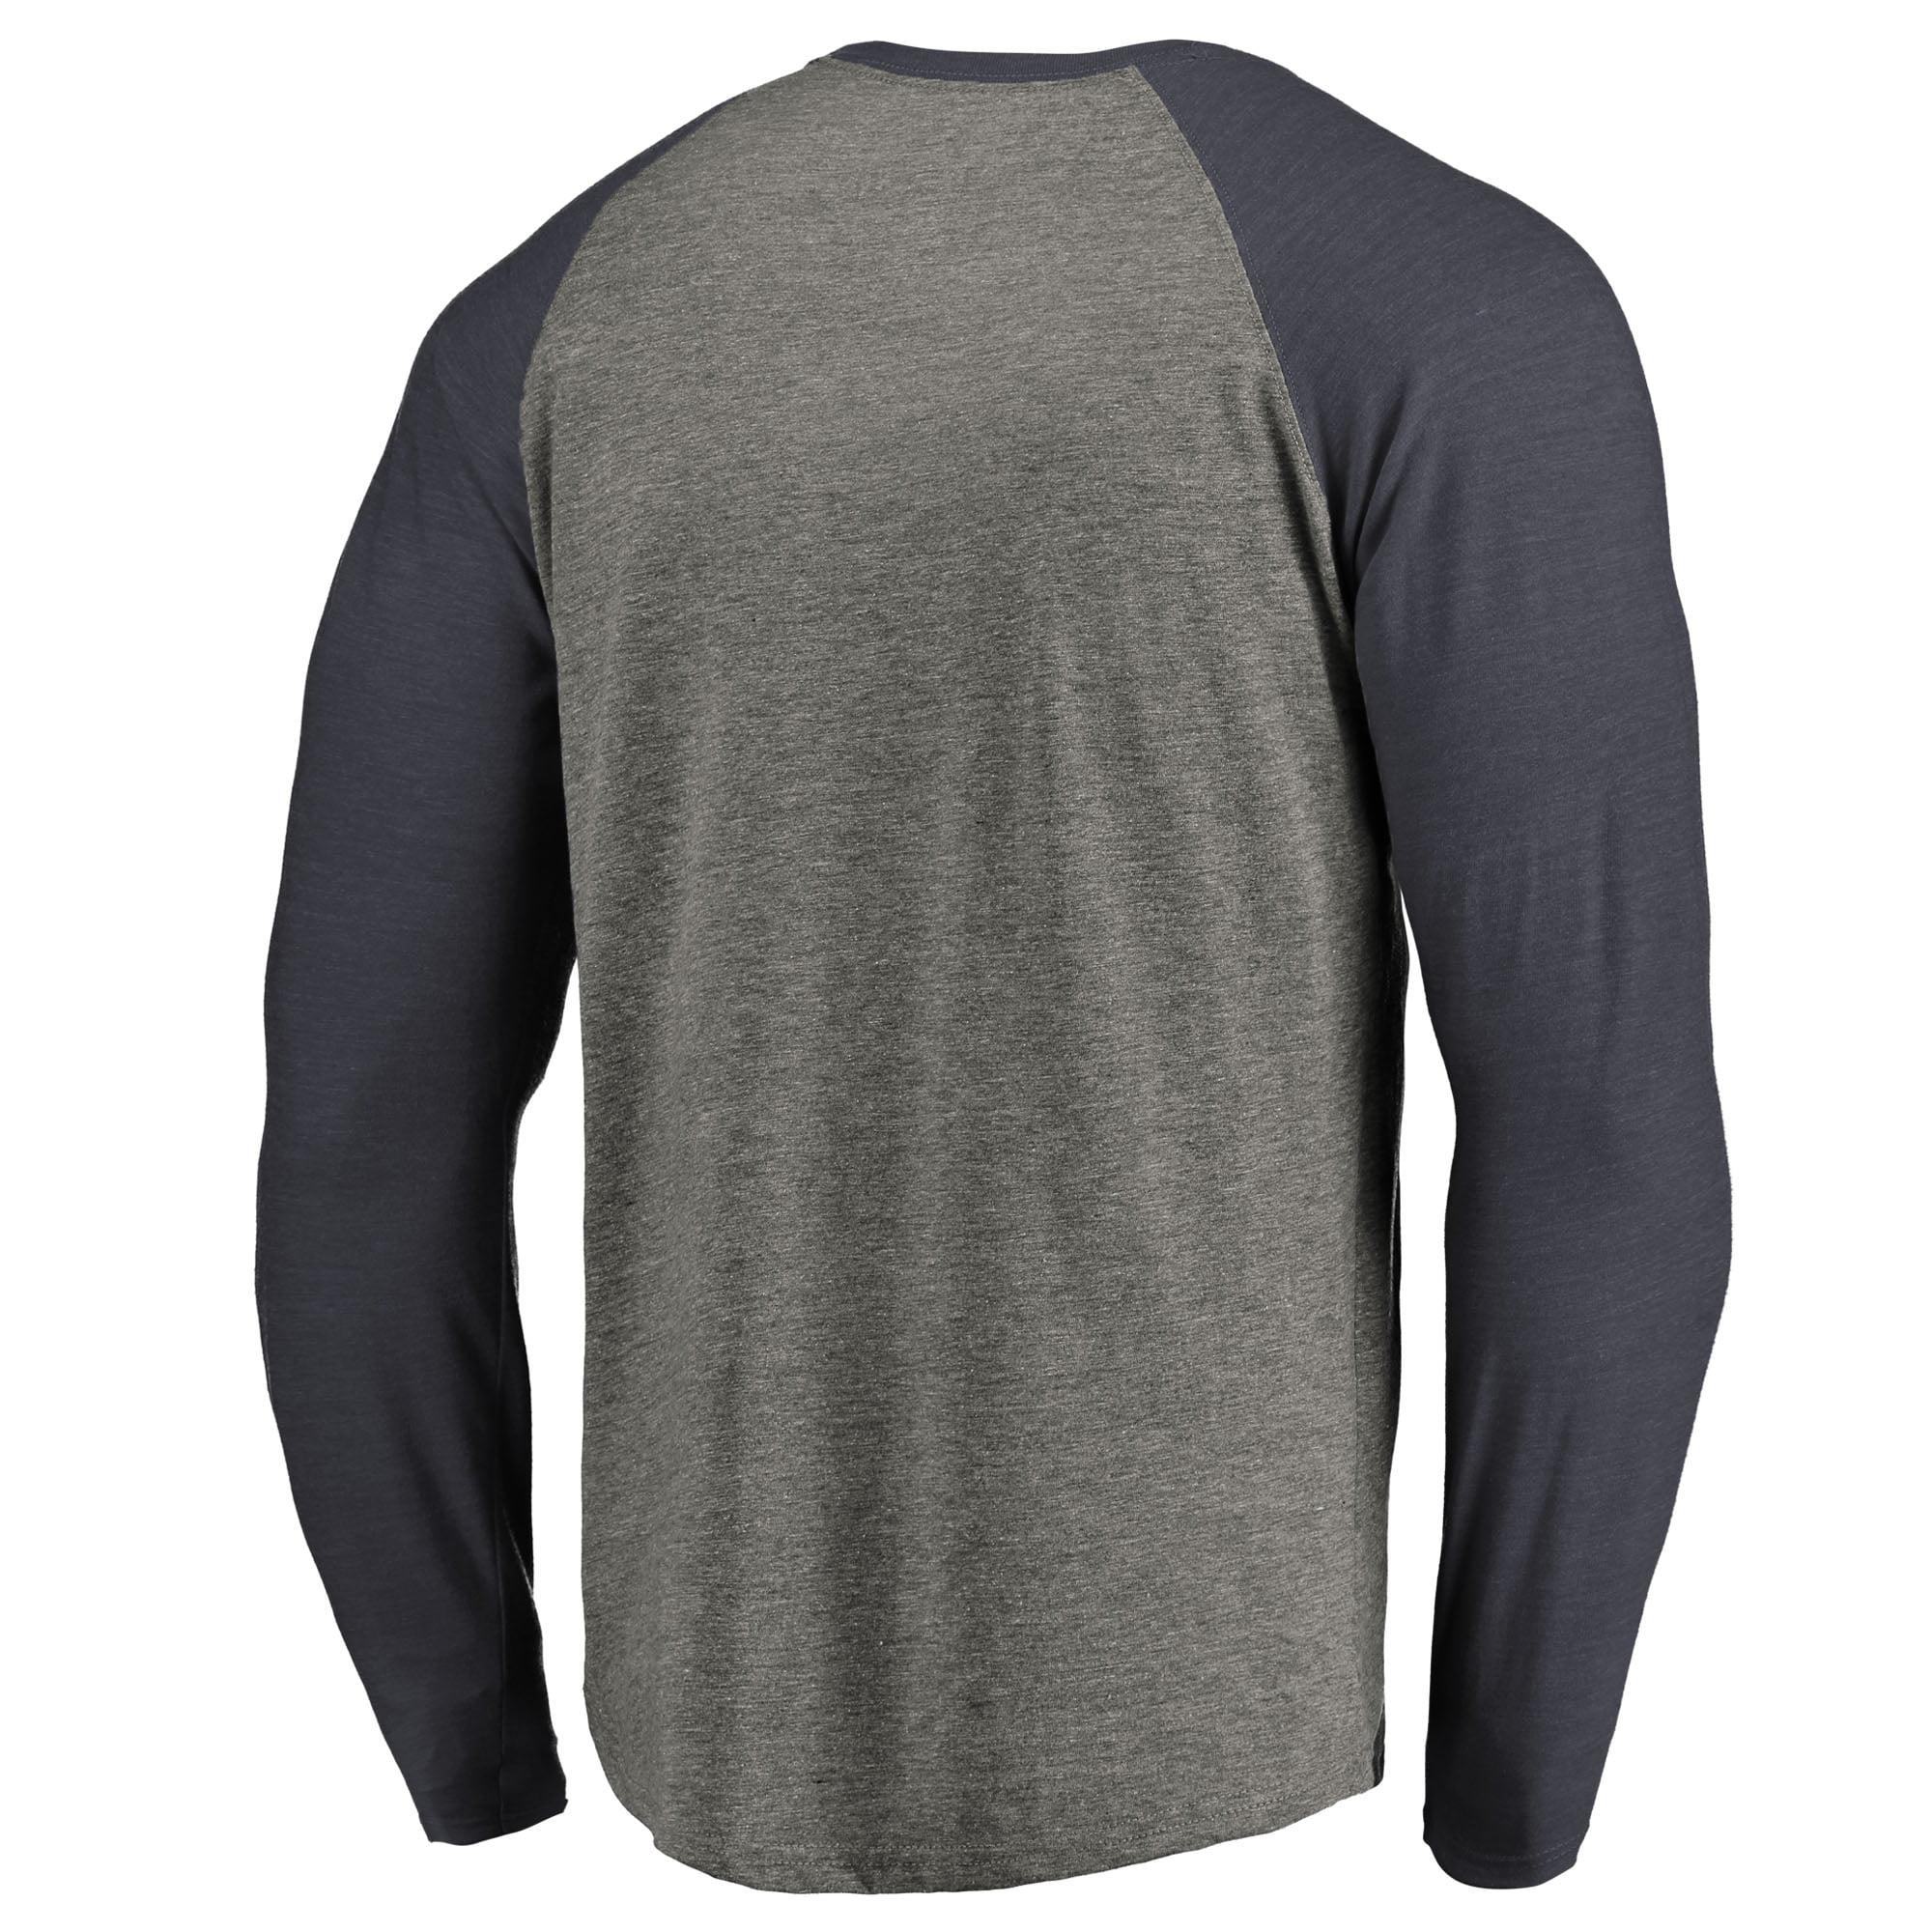 info for d34a3 7acd7 Washington Wizards Fanatics Branded Primary Wordmark Tri-Blend Long Sleeve T -Shirt - Heathered Gray - Walmart.com